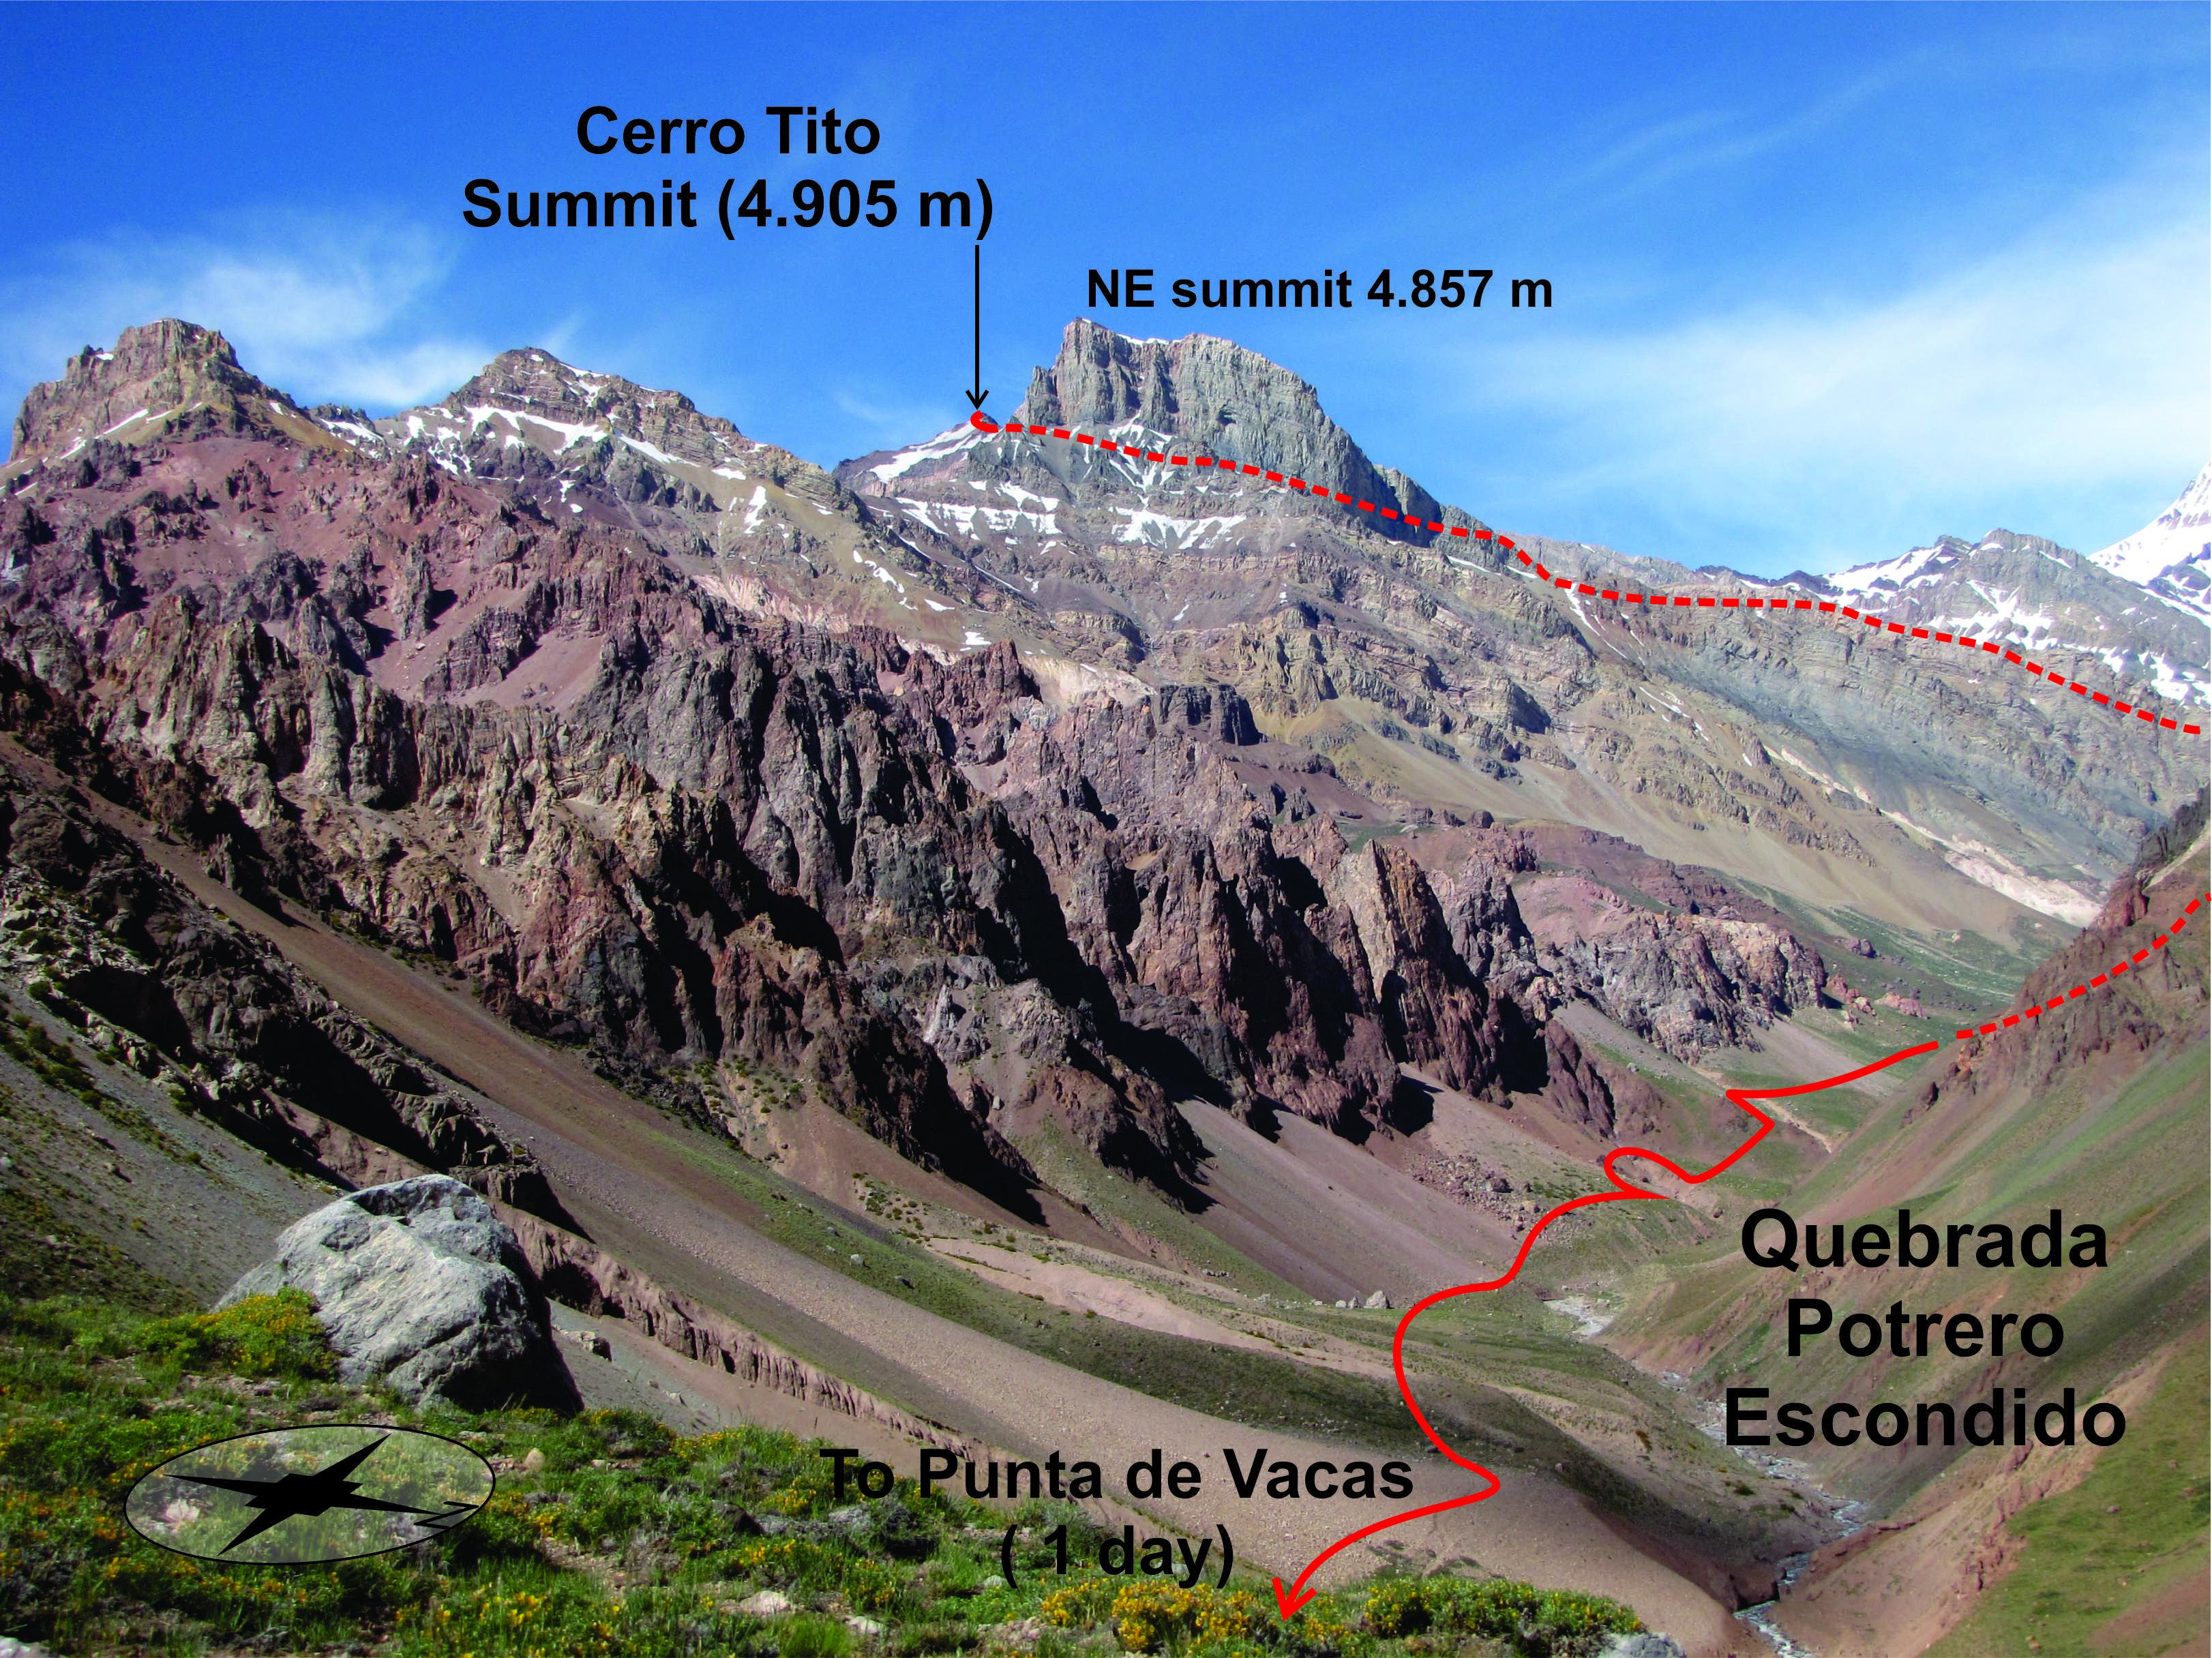 The initial approach to Cerro Tito.